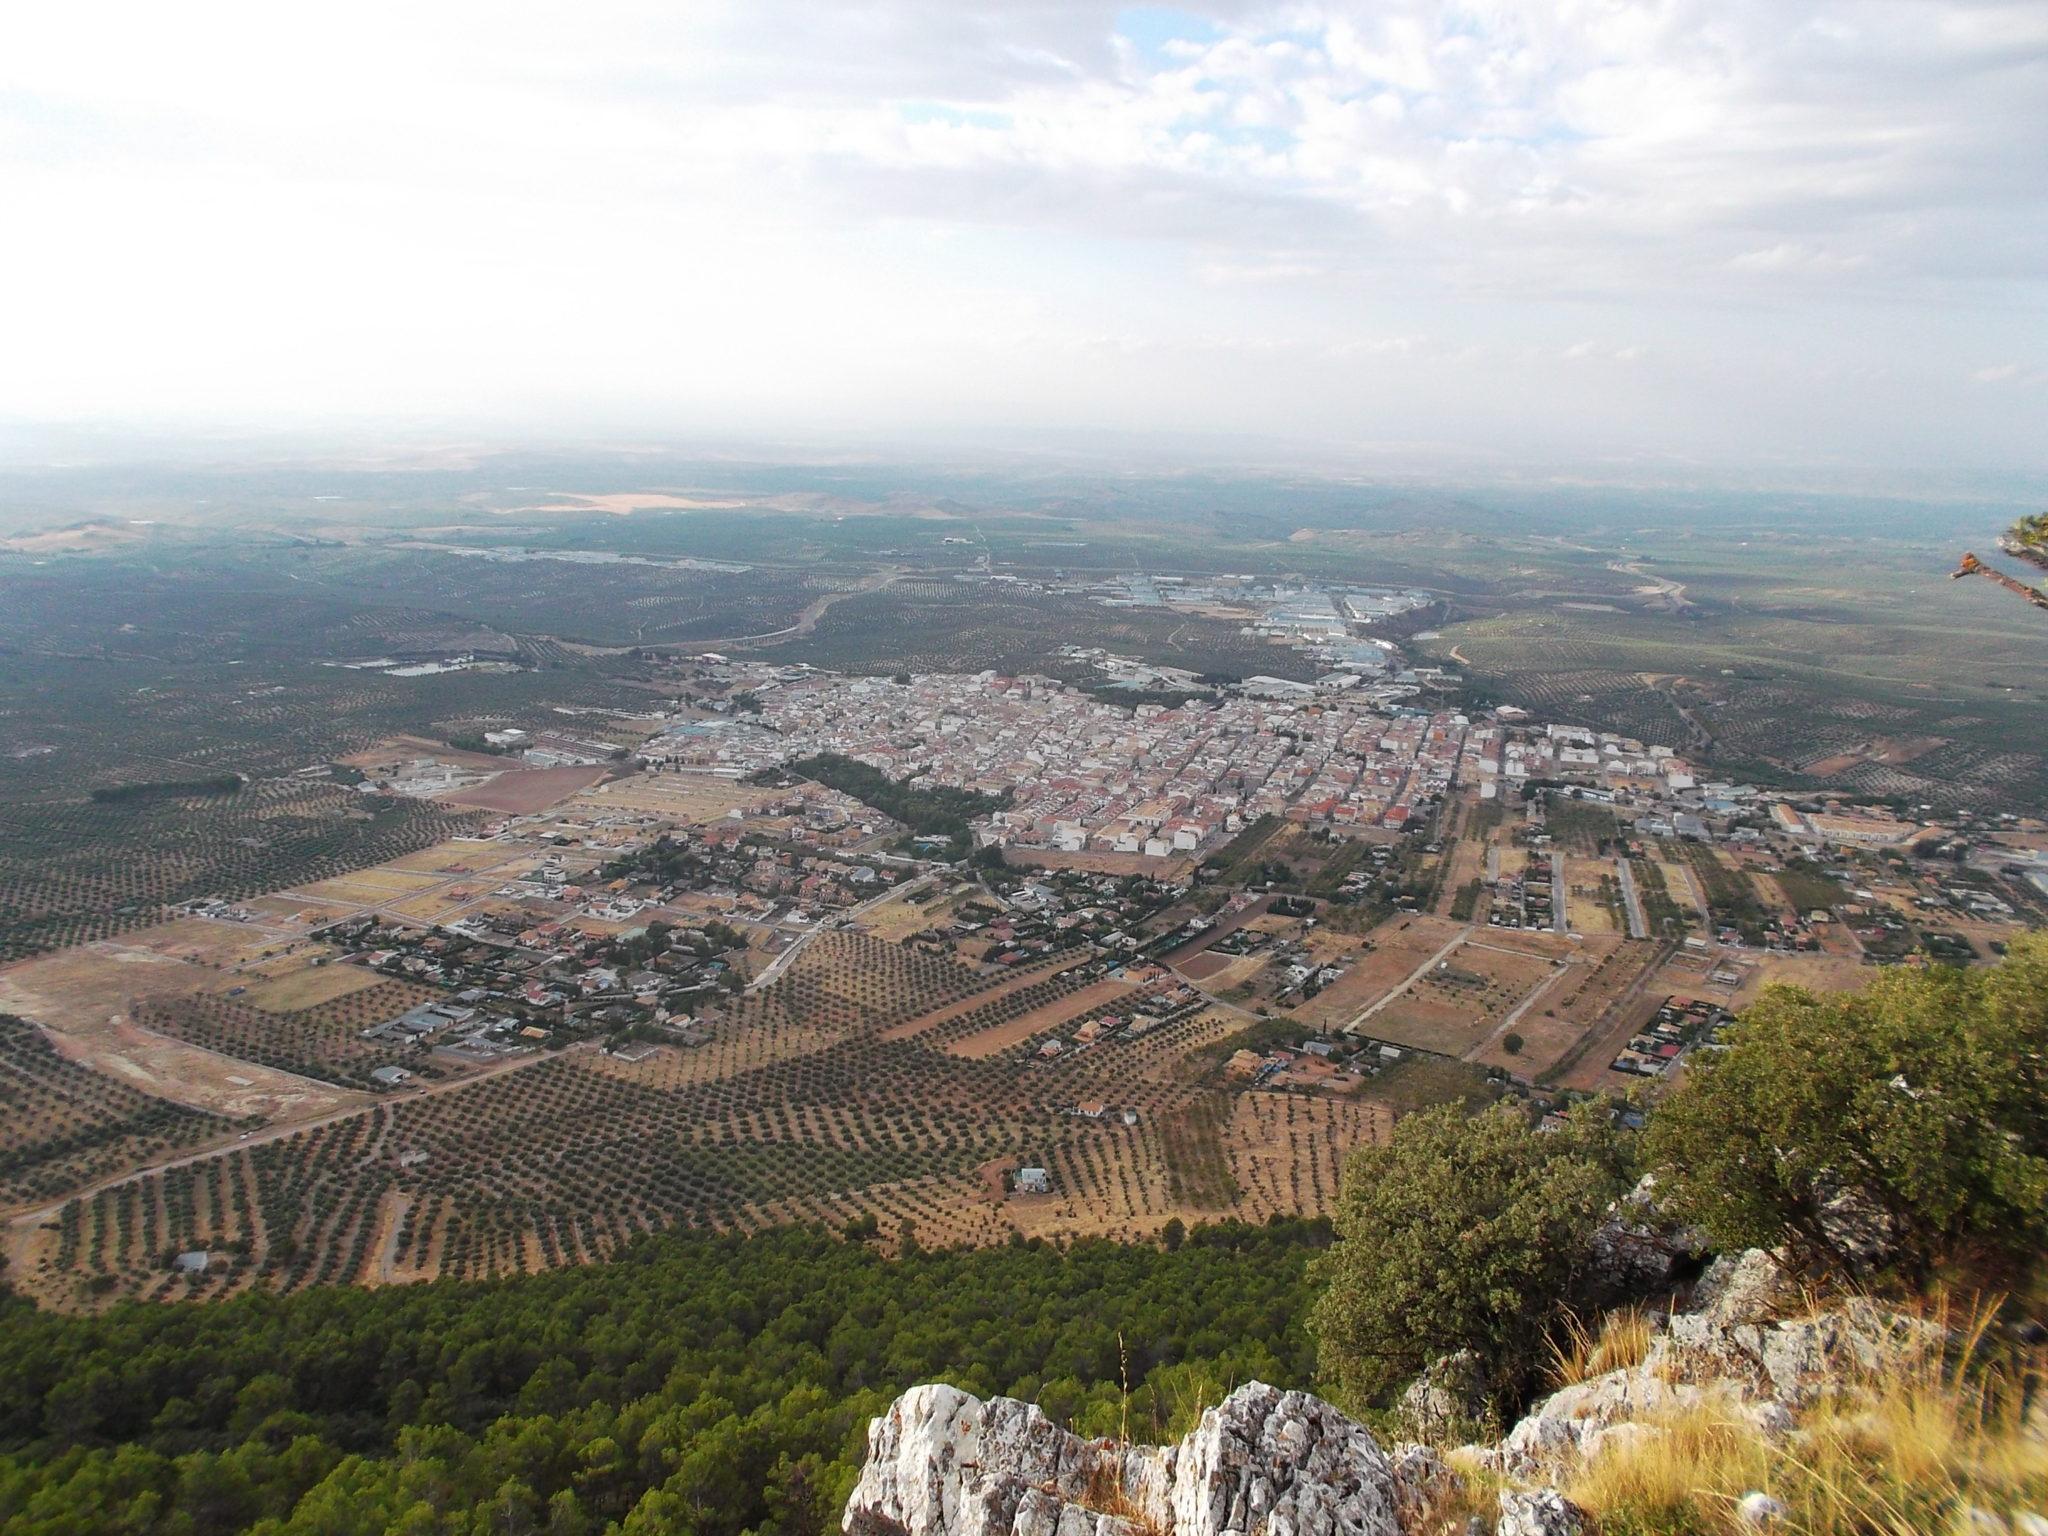 Imagen aerea de Mancha Real